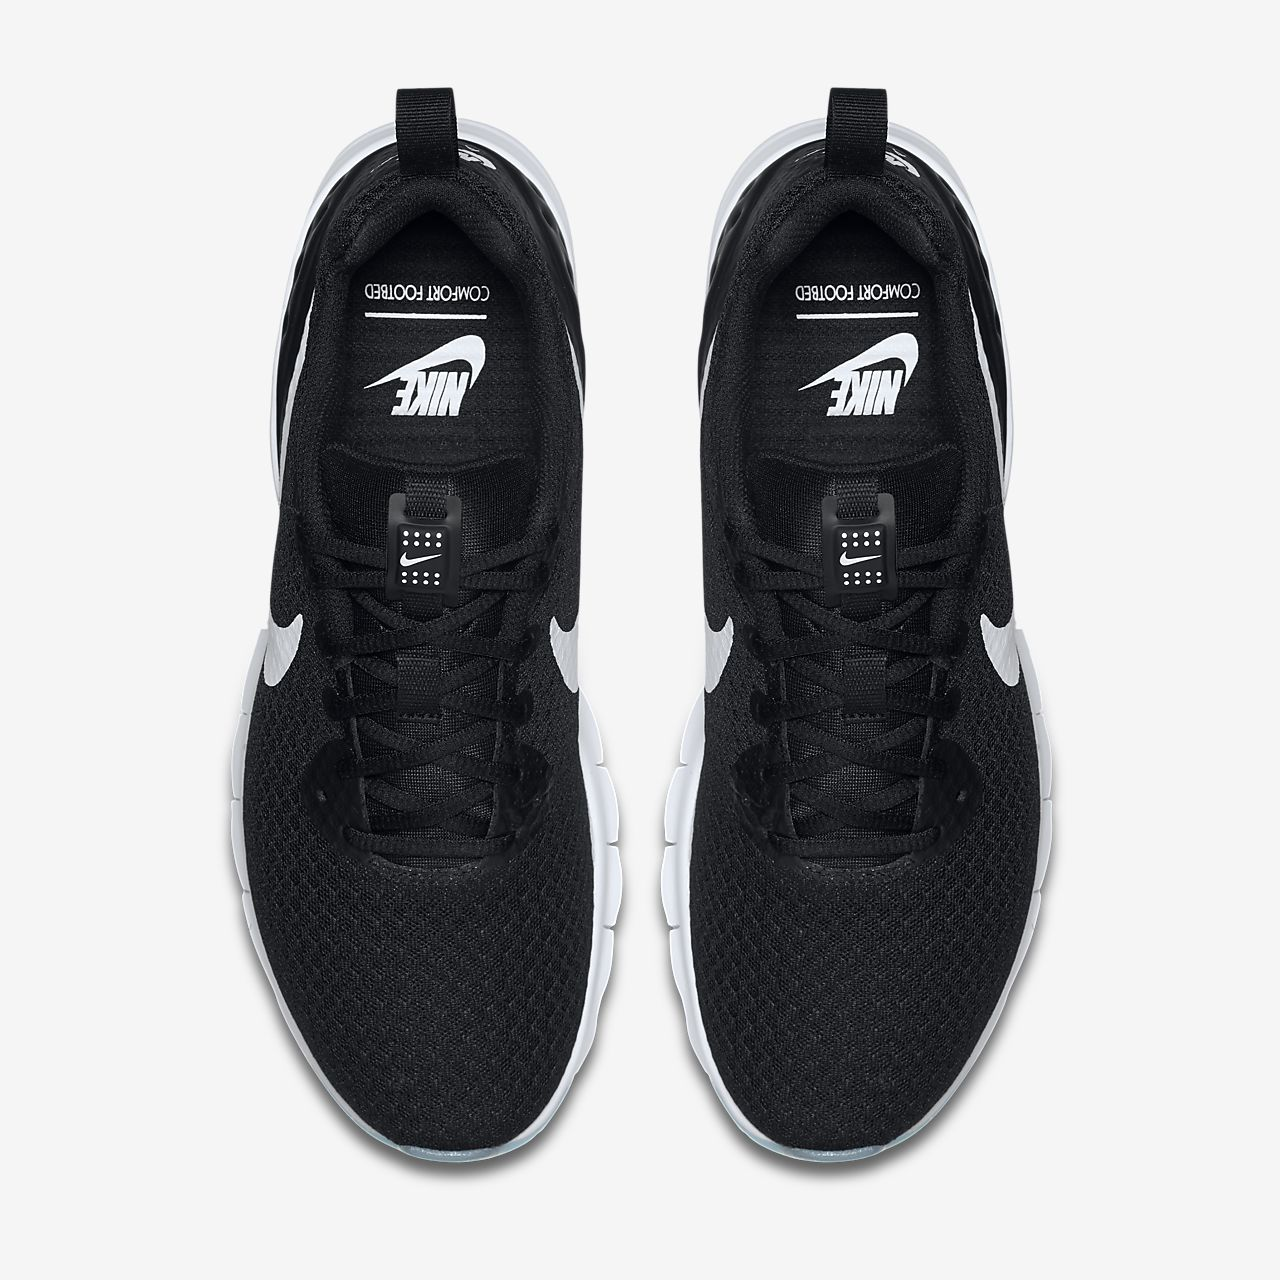 Scarpe Nike Air Max Motion Low nero bianco